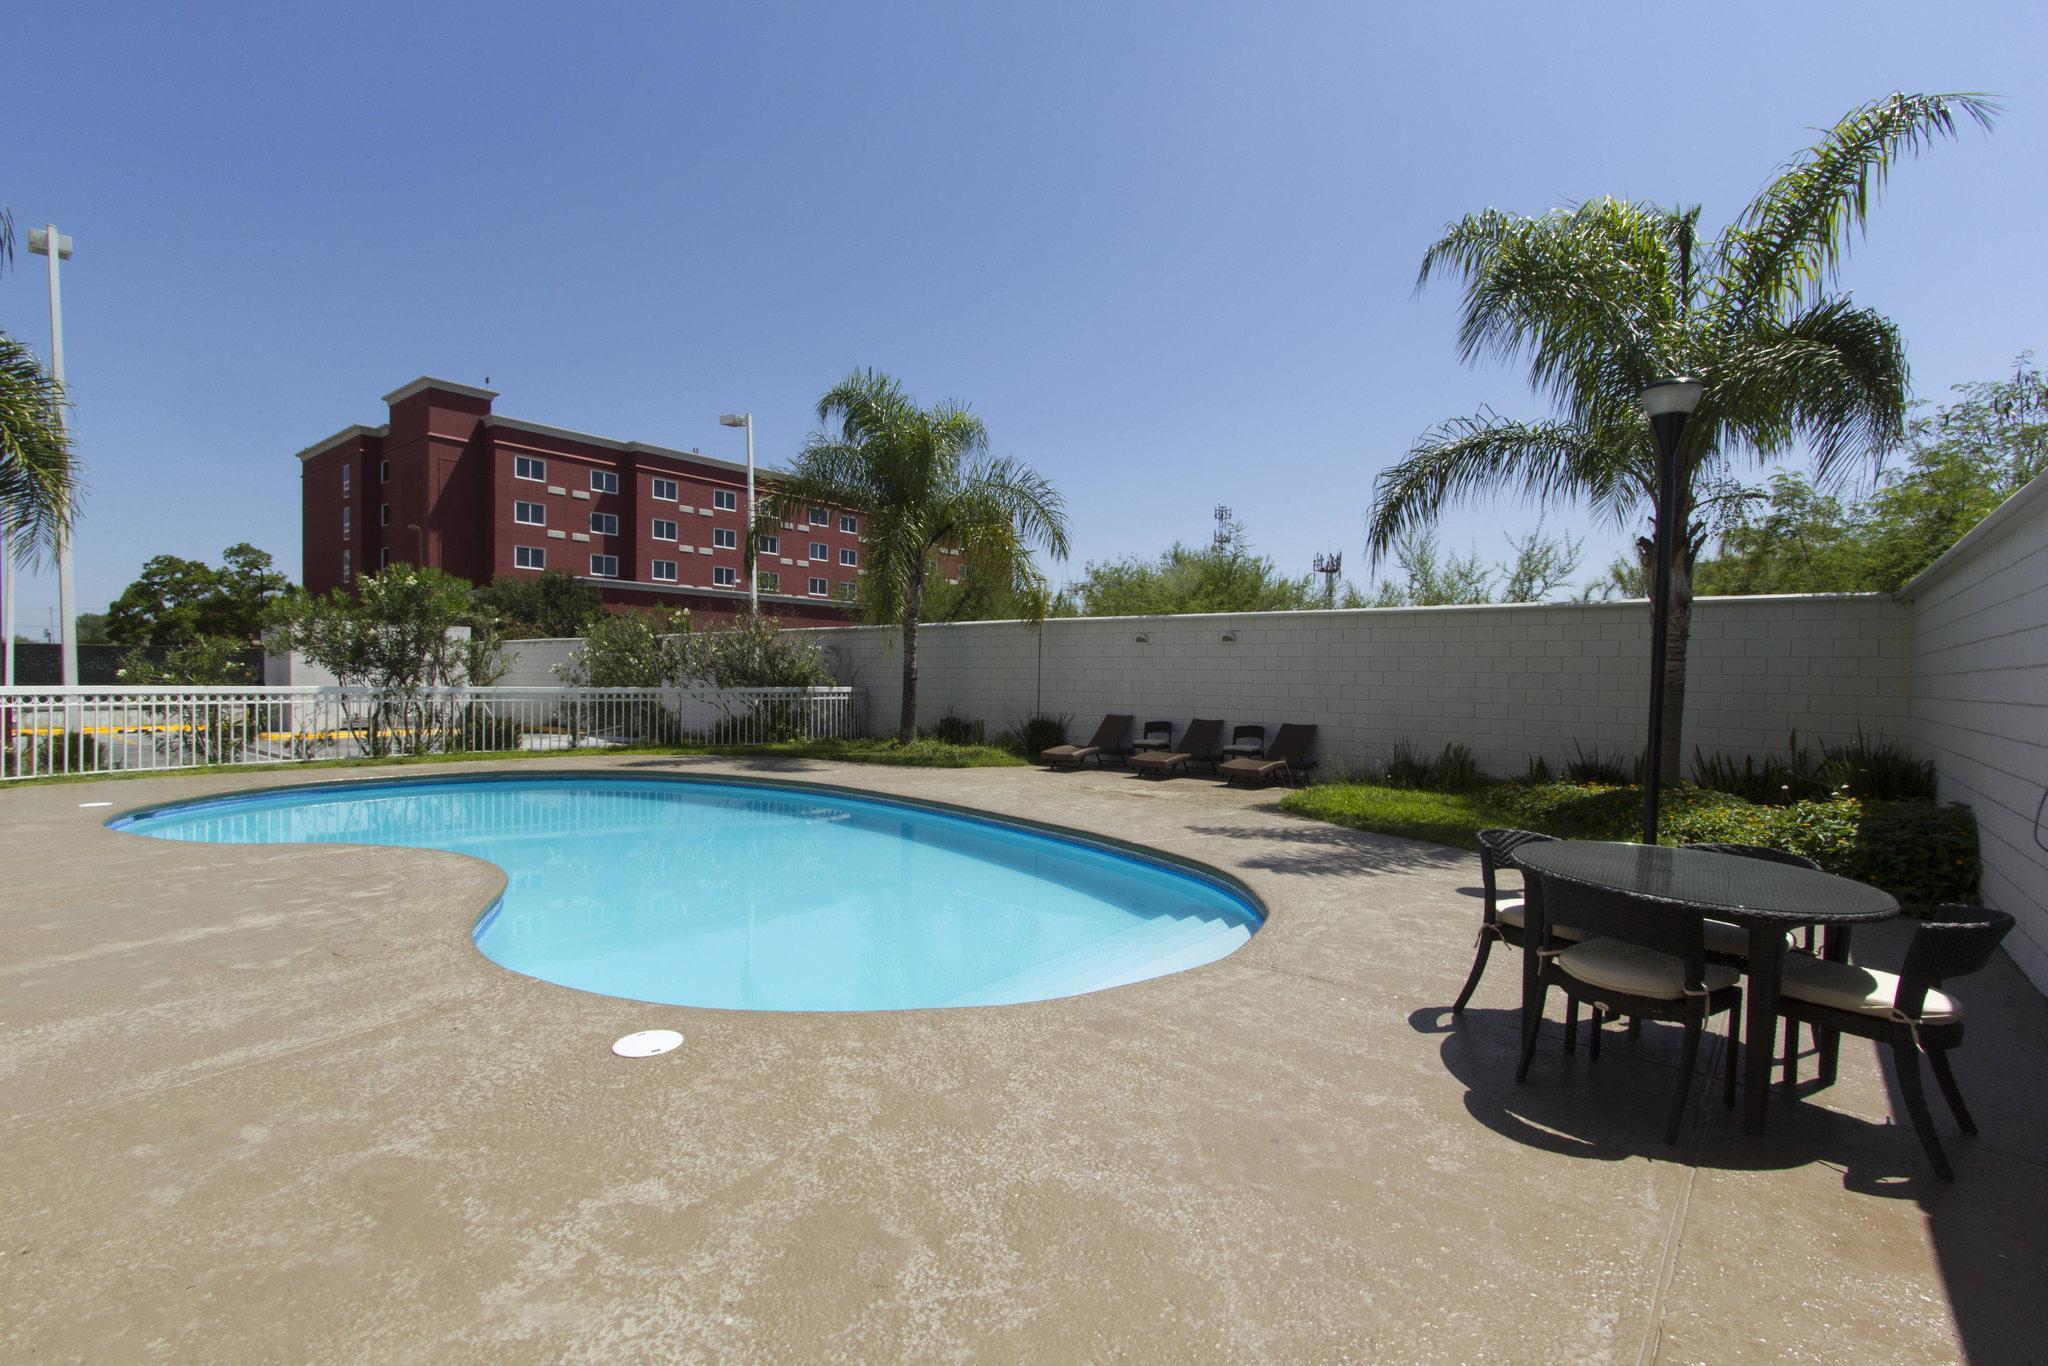 Fairfield Inn Monterrey Airport, Apodaca